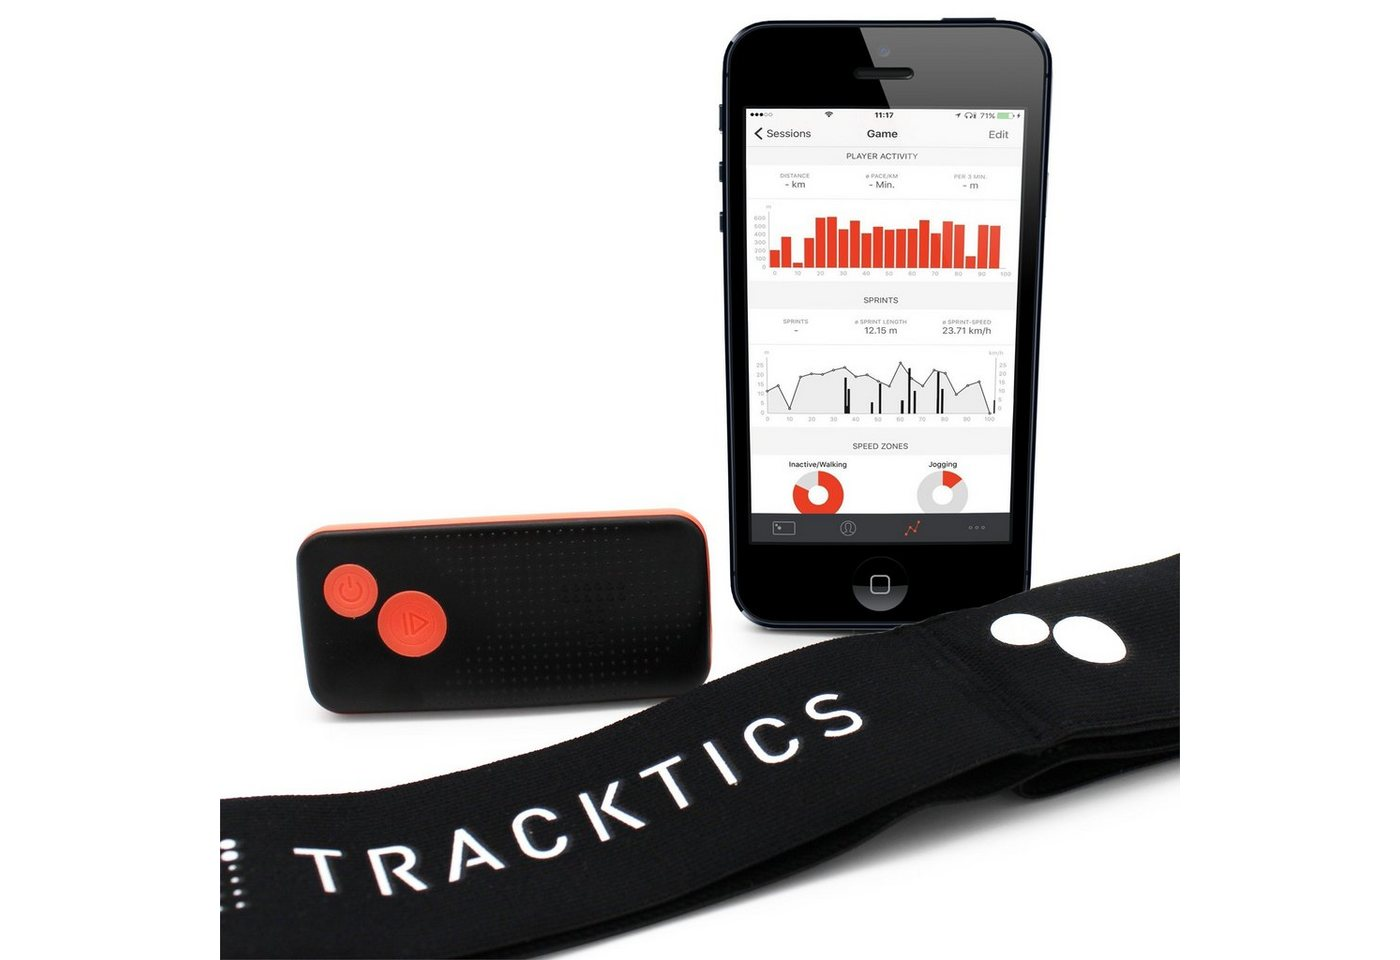 TRACKTICS Hüftgürtel »Gps Fußball Tracker« | Accessoires > Gürtel > Hüftgürtel | Schwarz | TRACKTICS